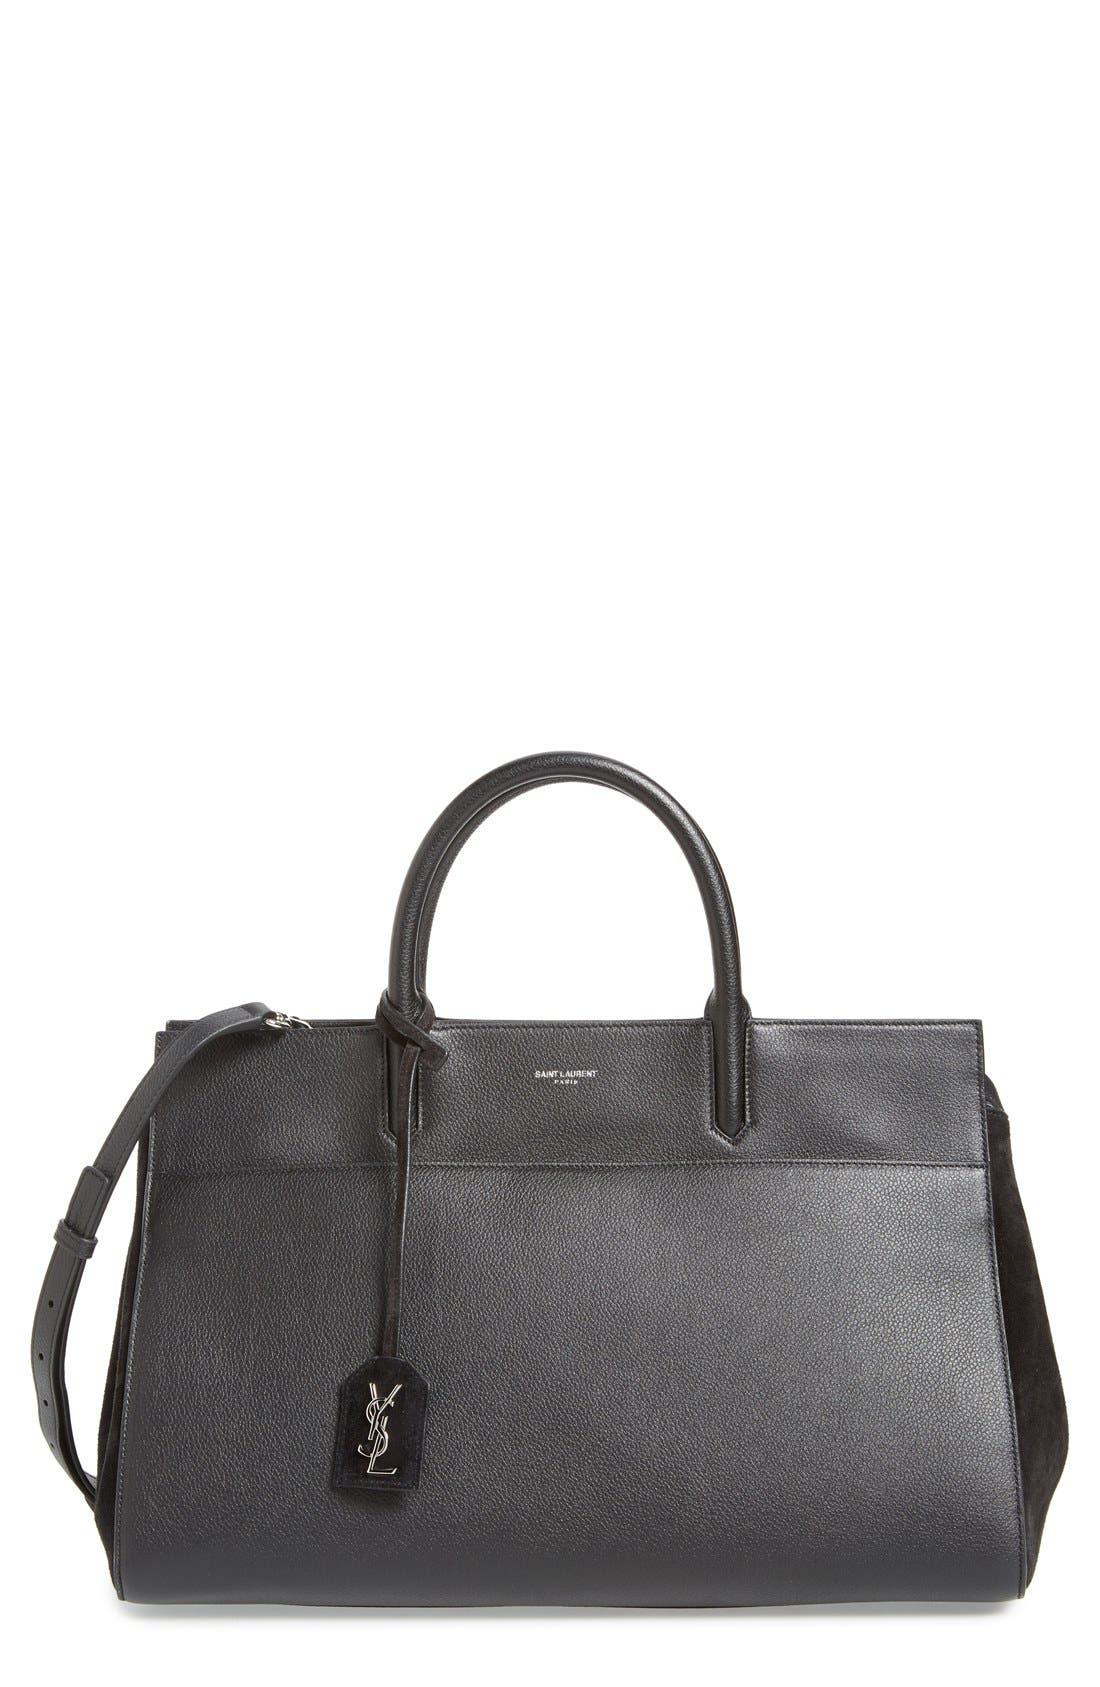 'Medium Rive Gauche' Grained Leather Satchel,                         Main,                         color, NERO